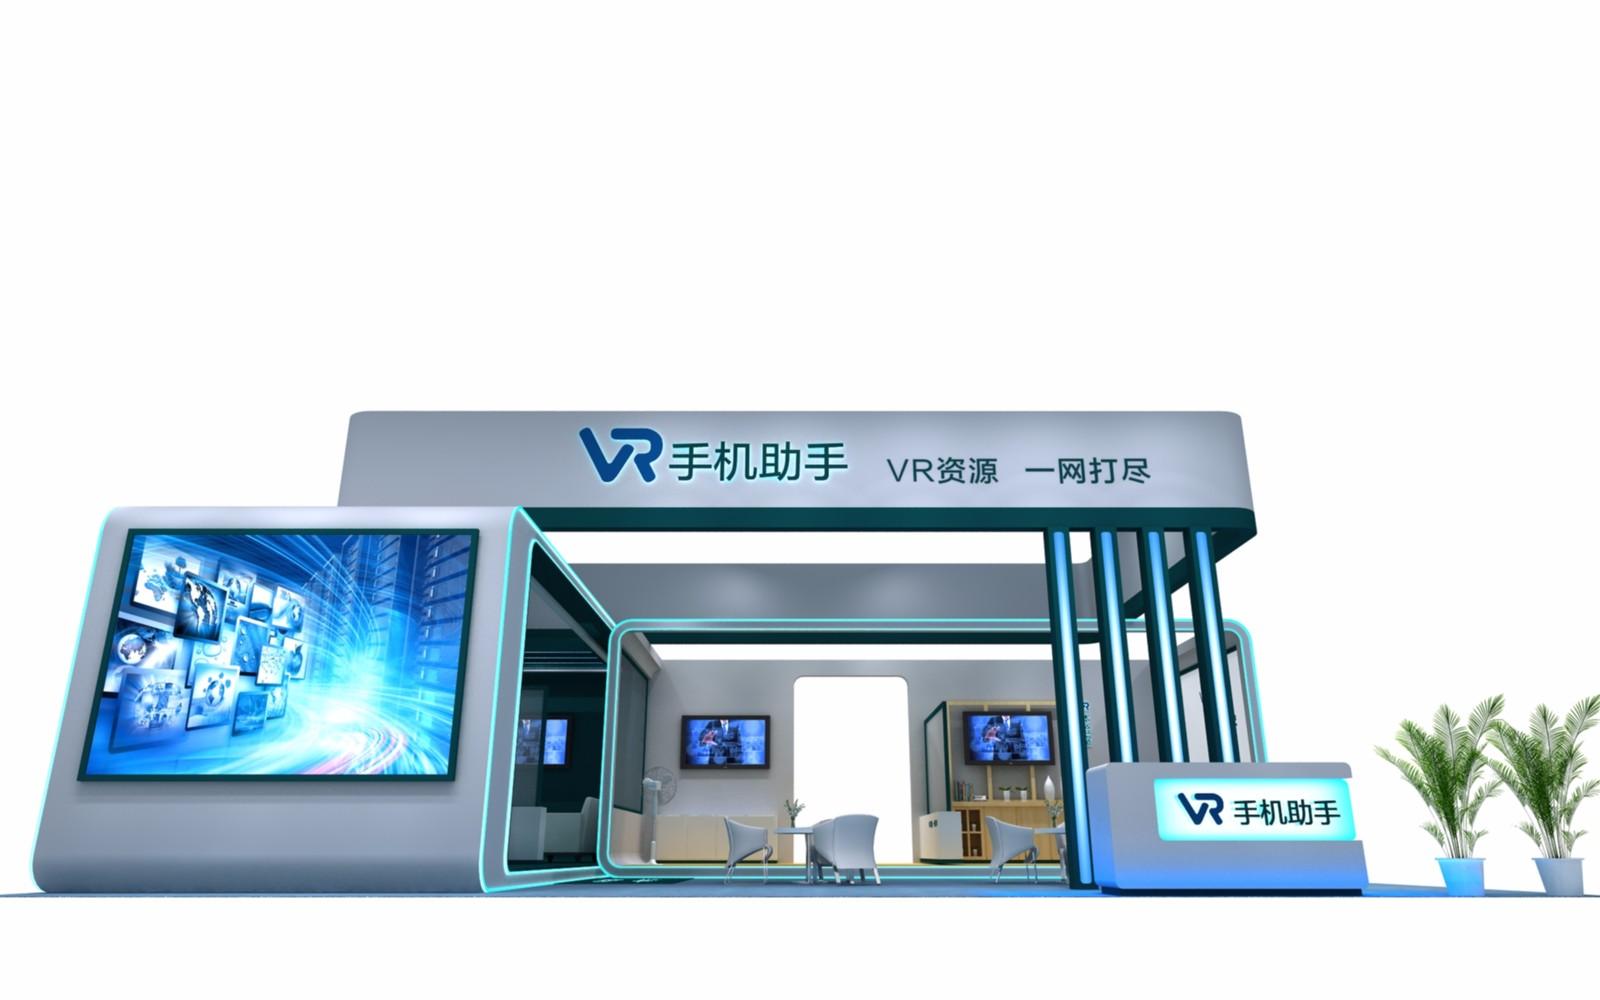 VR展-手机助手|展览特装-厦门市嘉维世纪会展服务有限公司